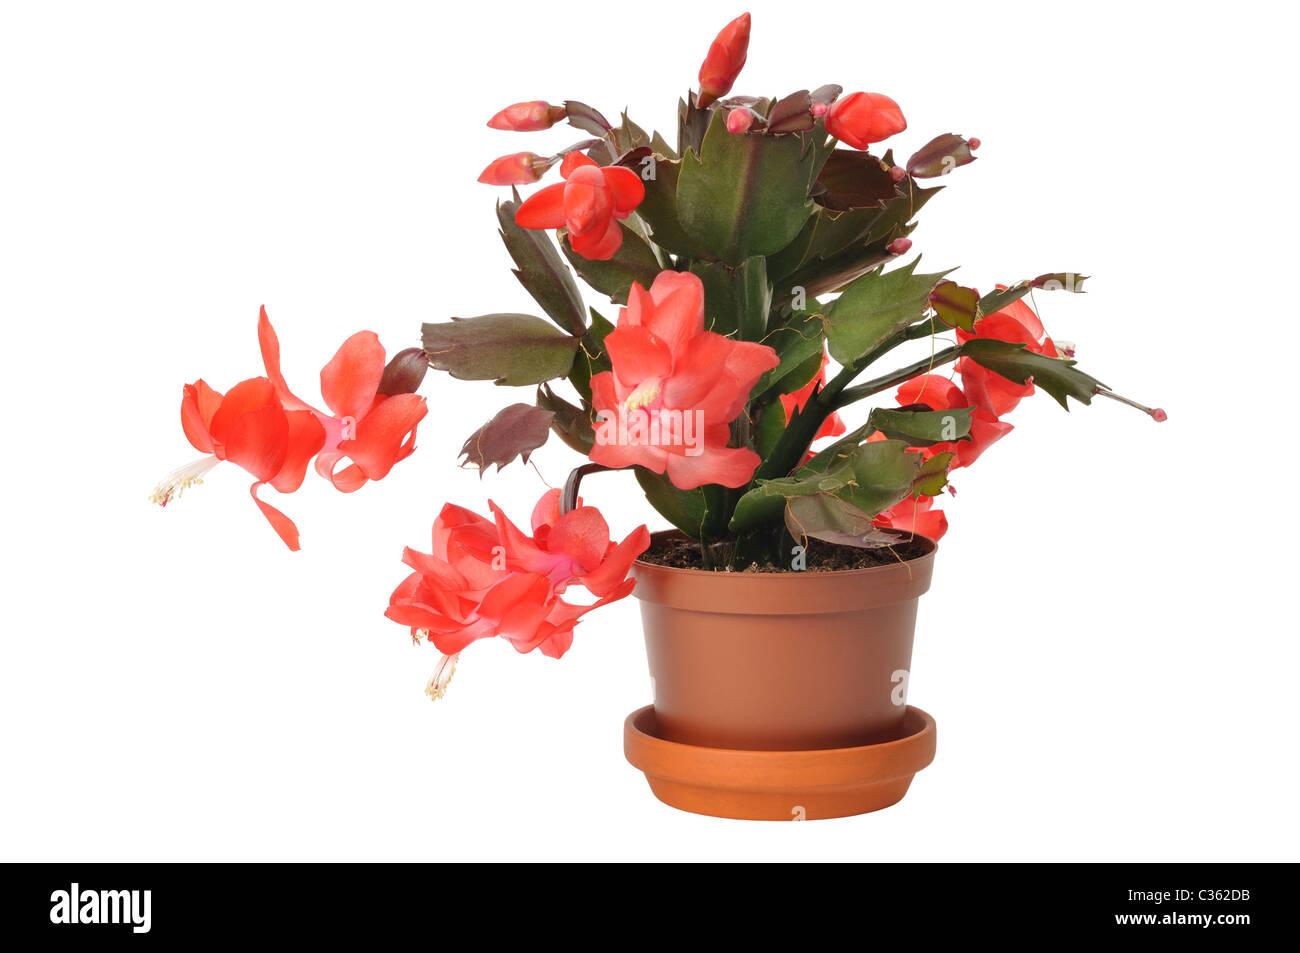 Blossoming Christmas Cactus (schlumbergera) - Stock Image